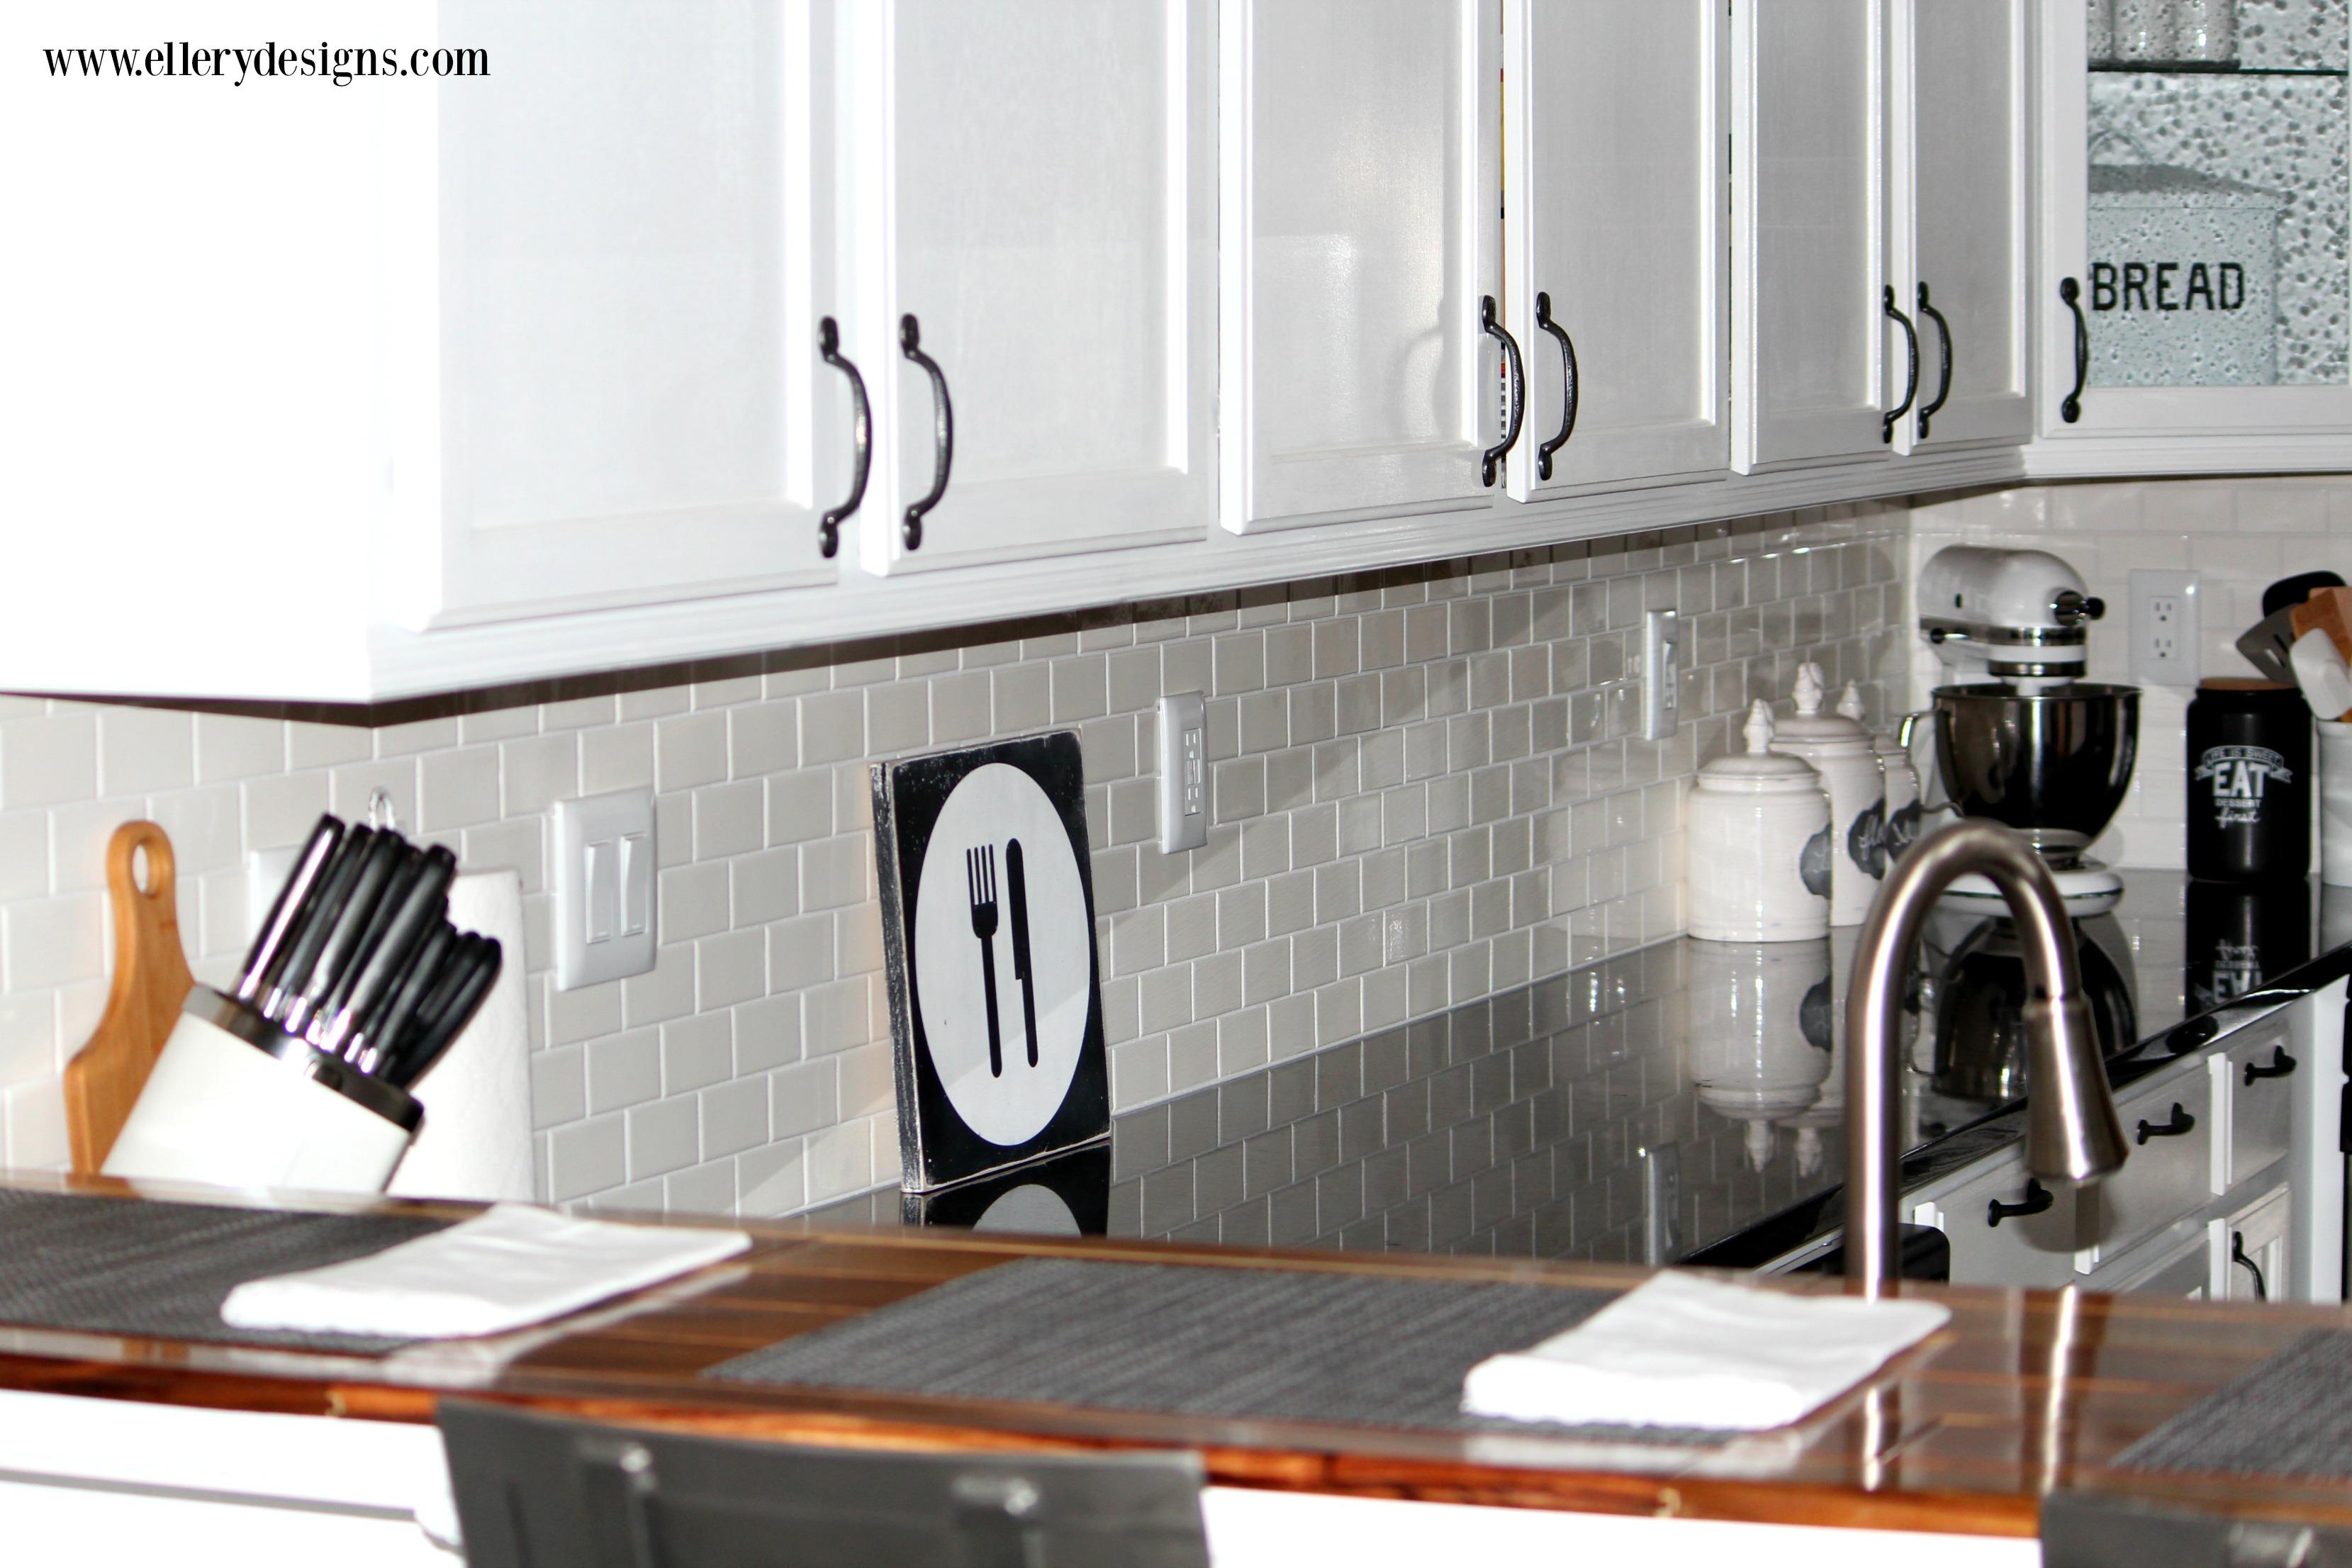 Amazing DIY White Kitchen Renovation by Ellery Designs